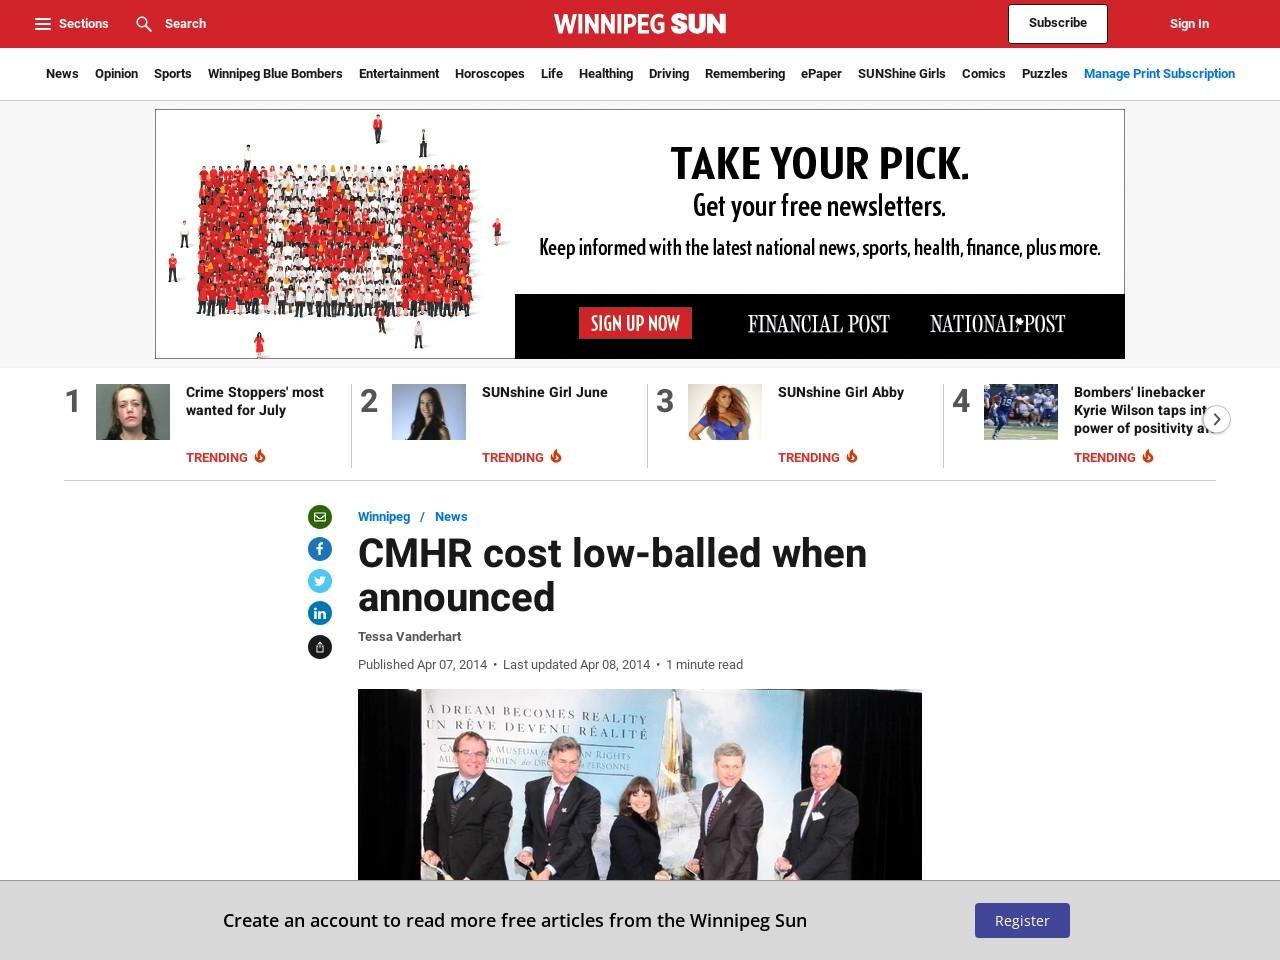 CMHR cost low-balled when announced | Winnipeg | News …